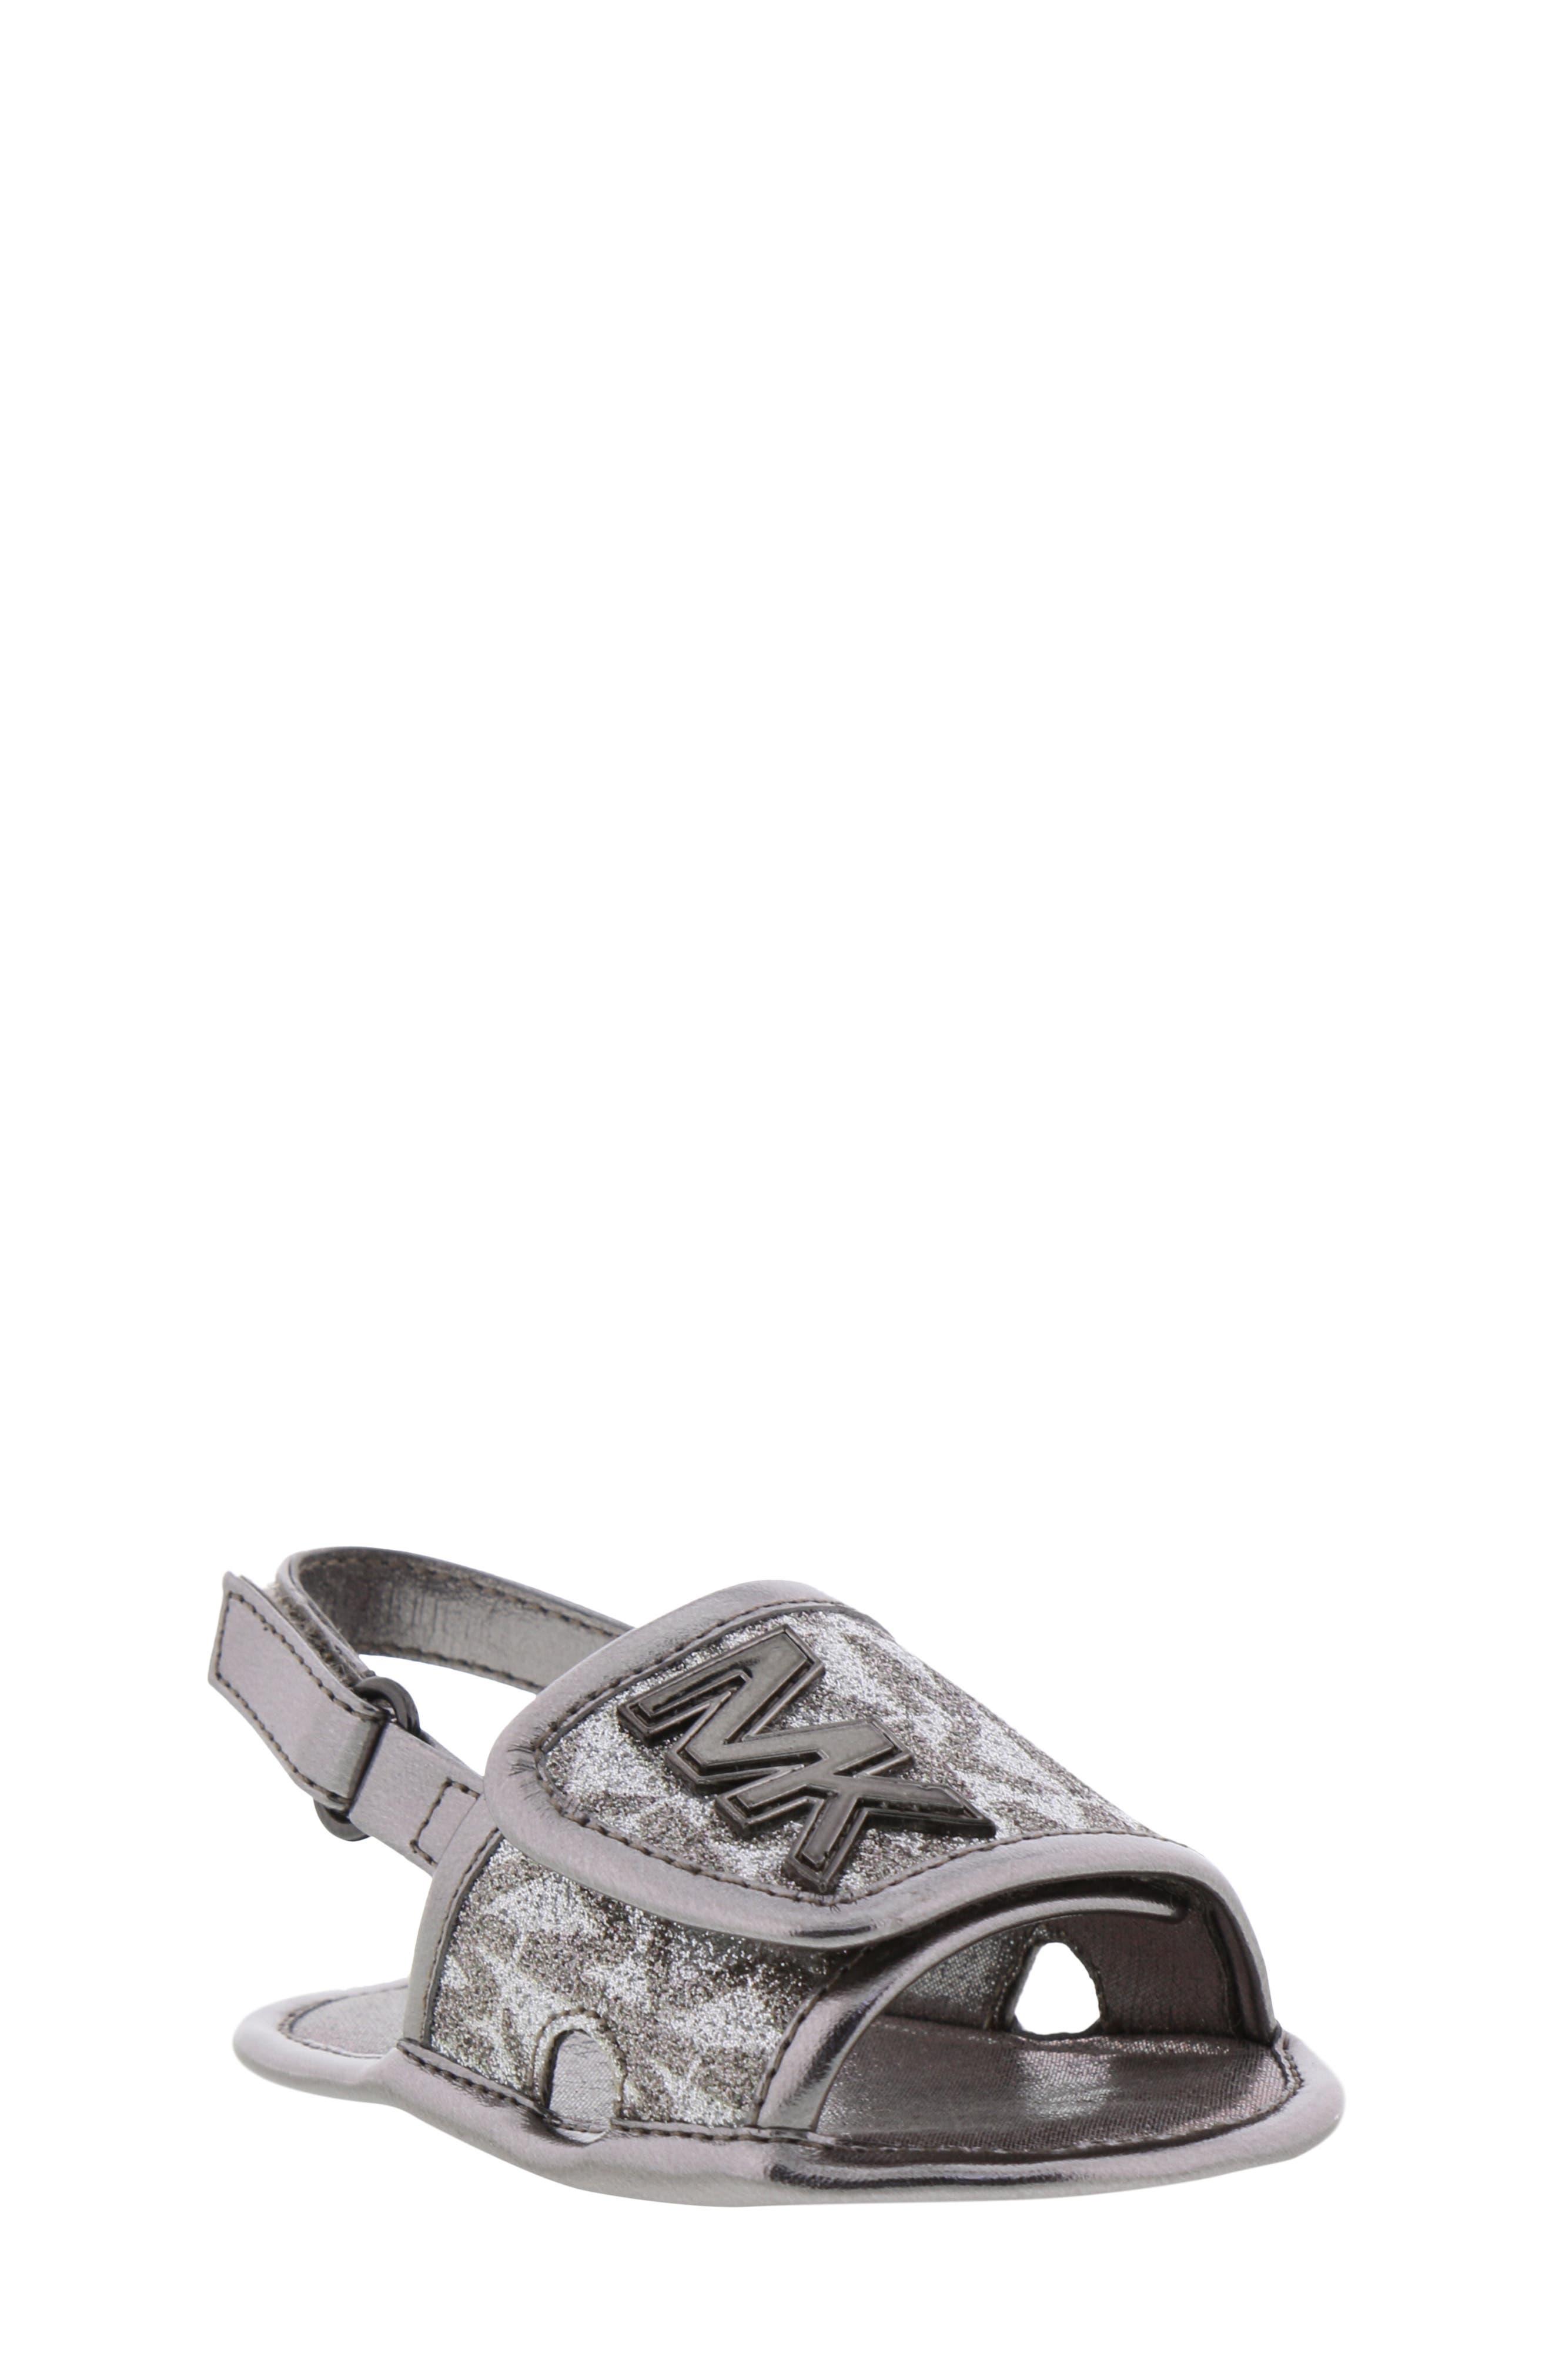 19f831f60c2d MICHAEL Michael Kors Baby   Walker Shoes Under  30